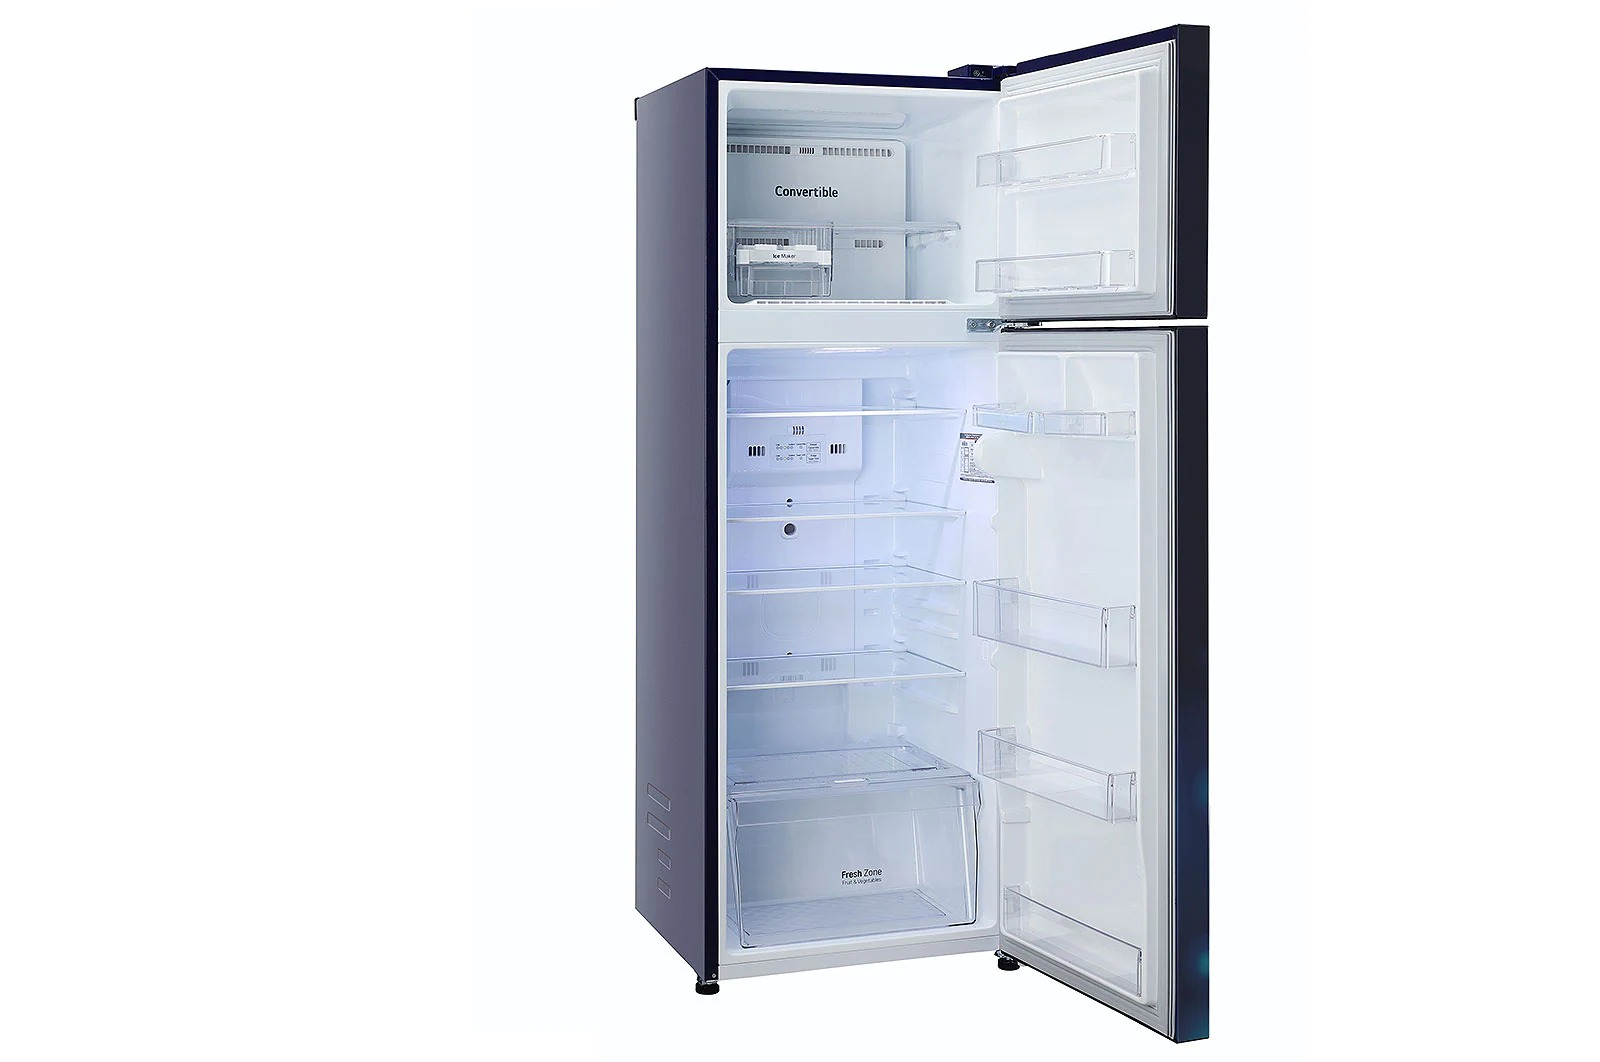 LG (GL-T322SBCY) 308 Litres ConvertiblePLUS Fridge With Smart Inverter Compressor , Door Cooling+™, Smart Diagnosis™, Auto Smart Connect™